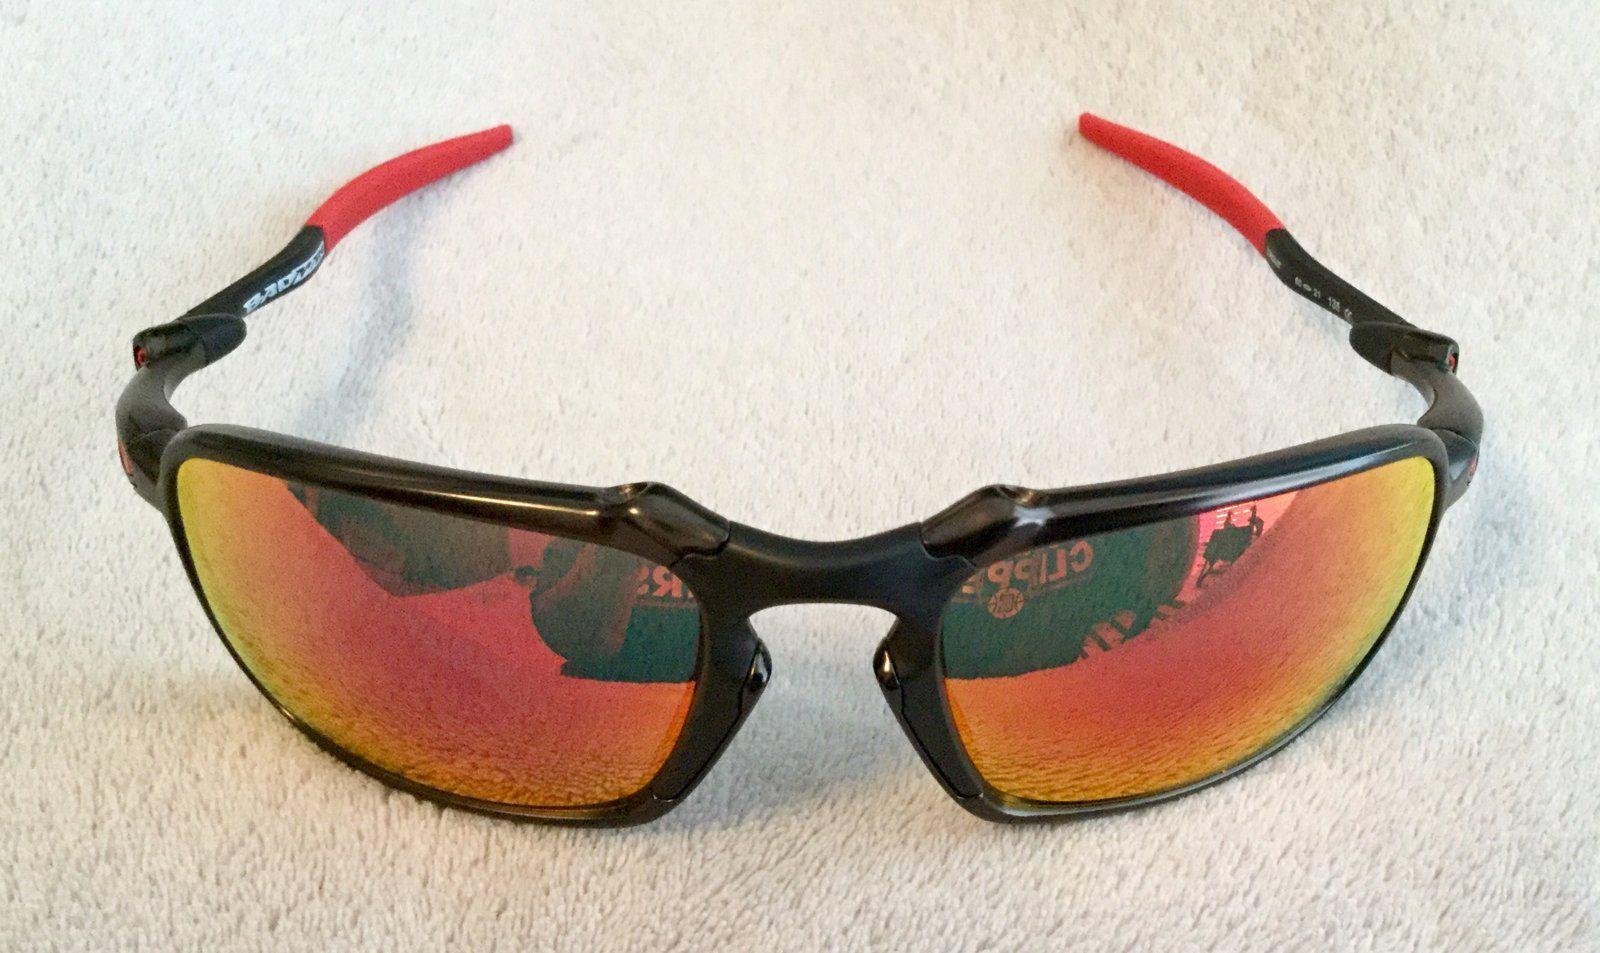 ce4b8f1ae1 Oakley Badman Scuderia Ferrari Sunglasses (New) - E694CD34-B1D8-4B33-8A10